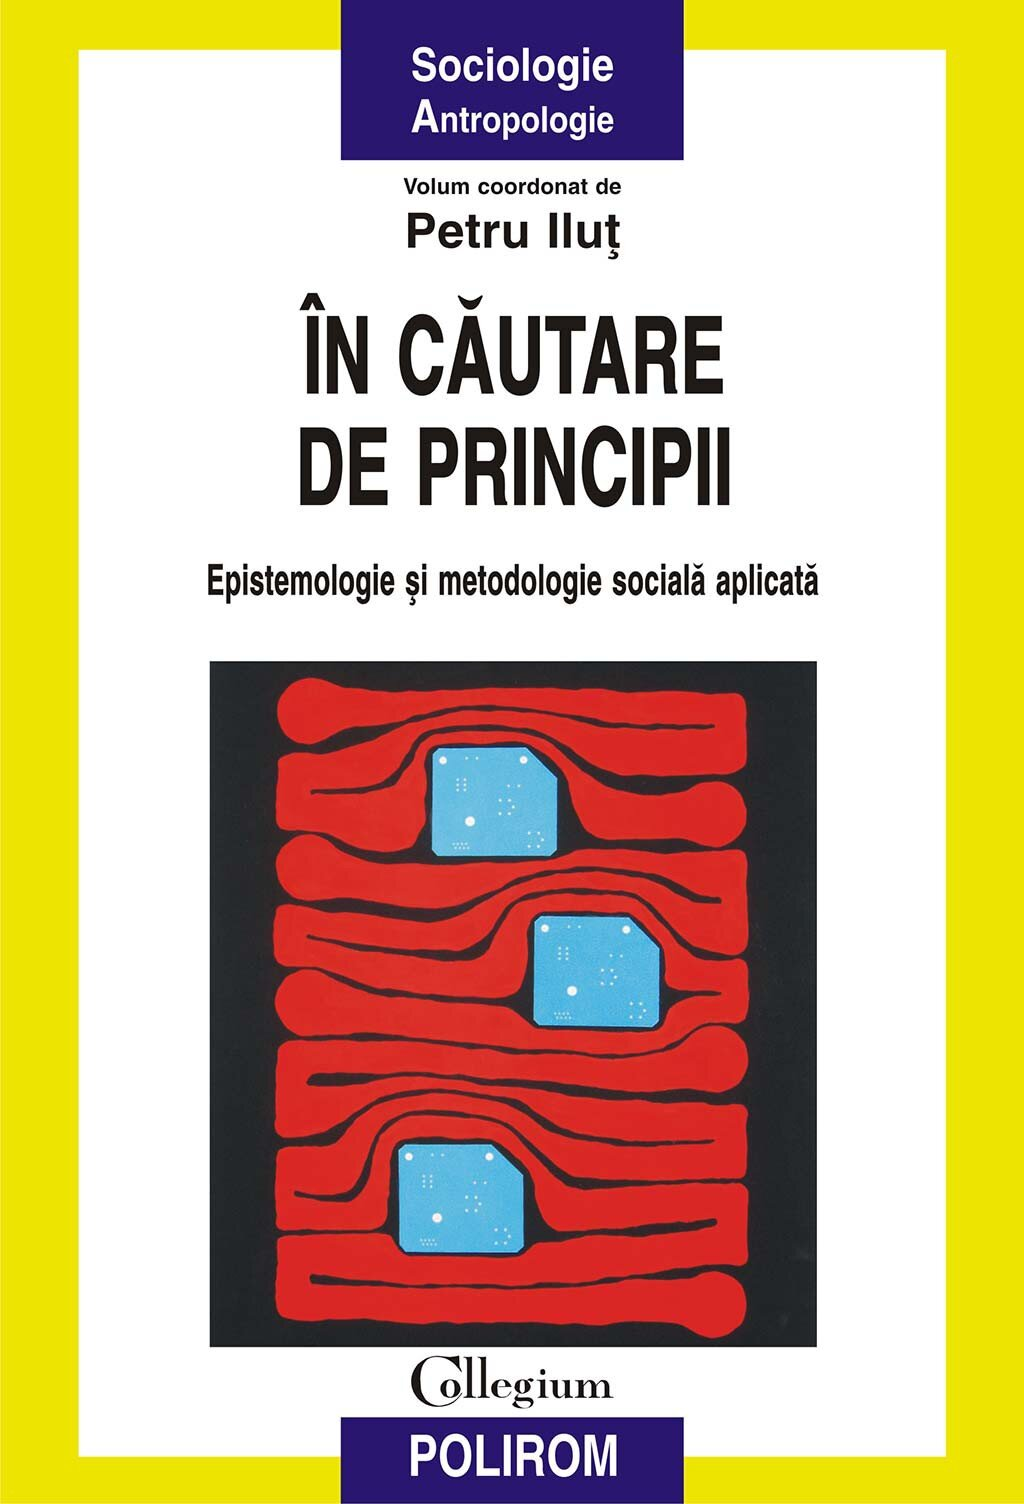 In cautare de principii. Epistemologie si metodologie sociala aplicata PDF (Download eBook)